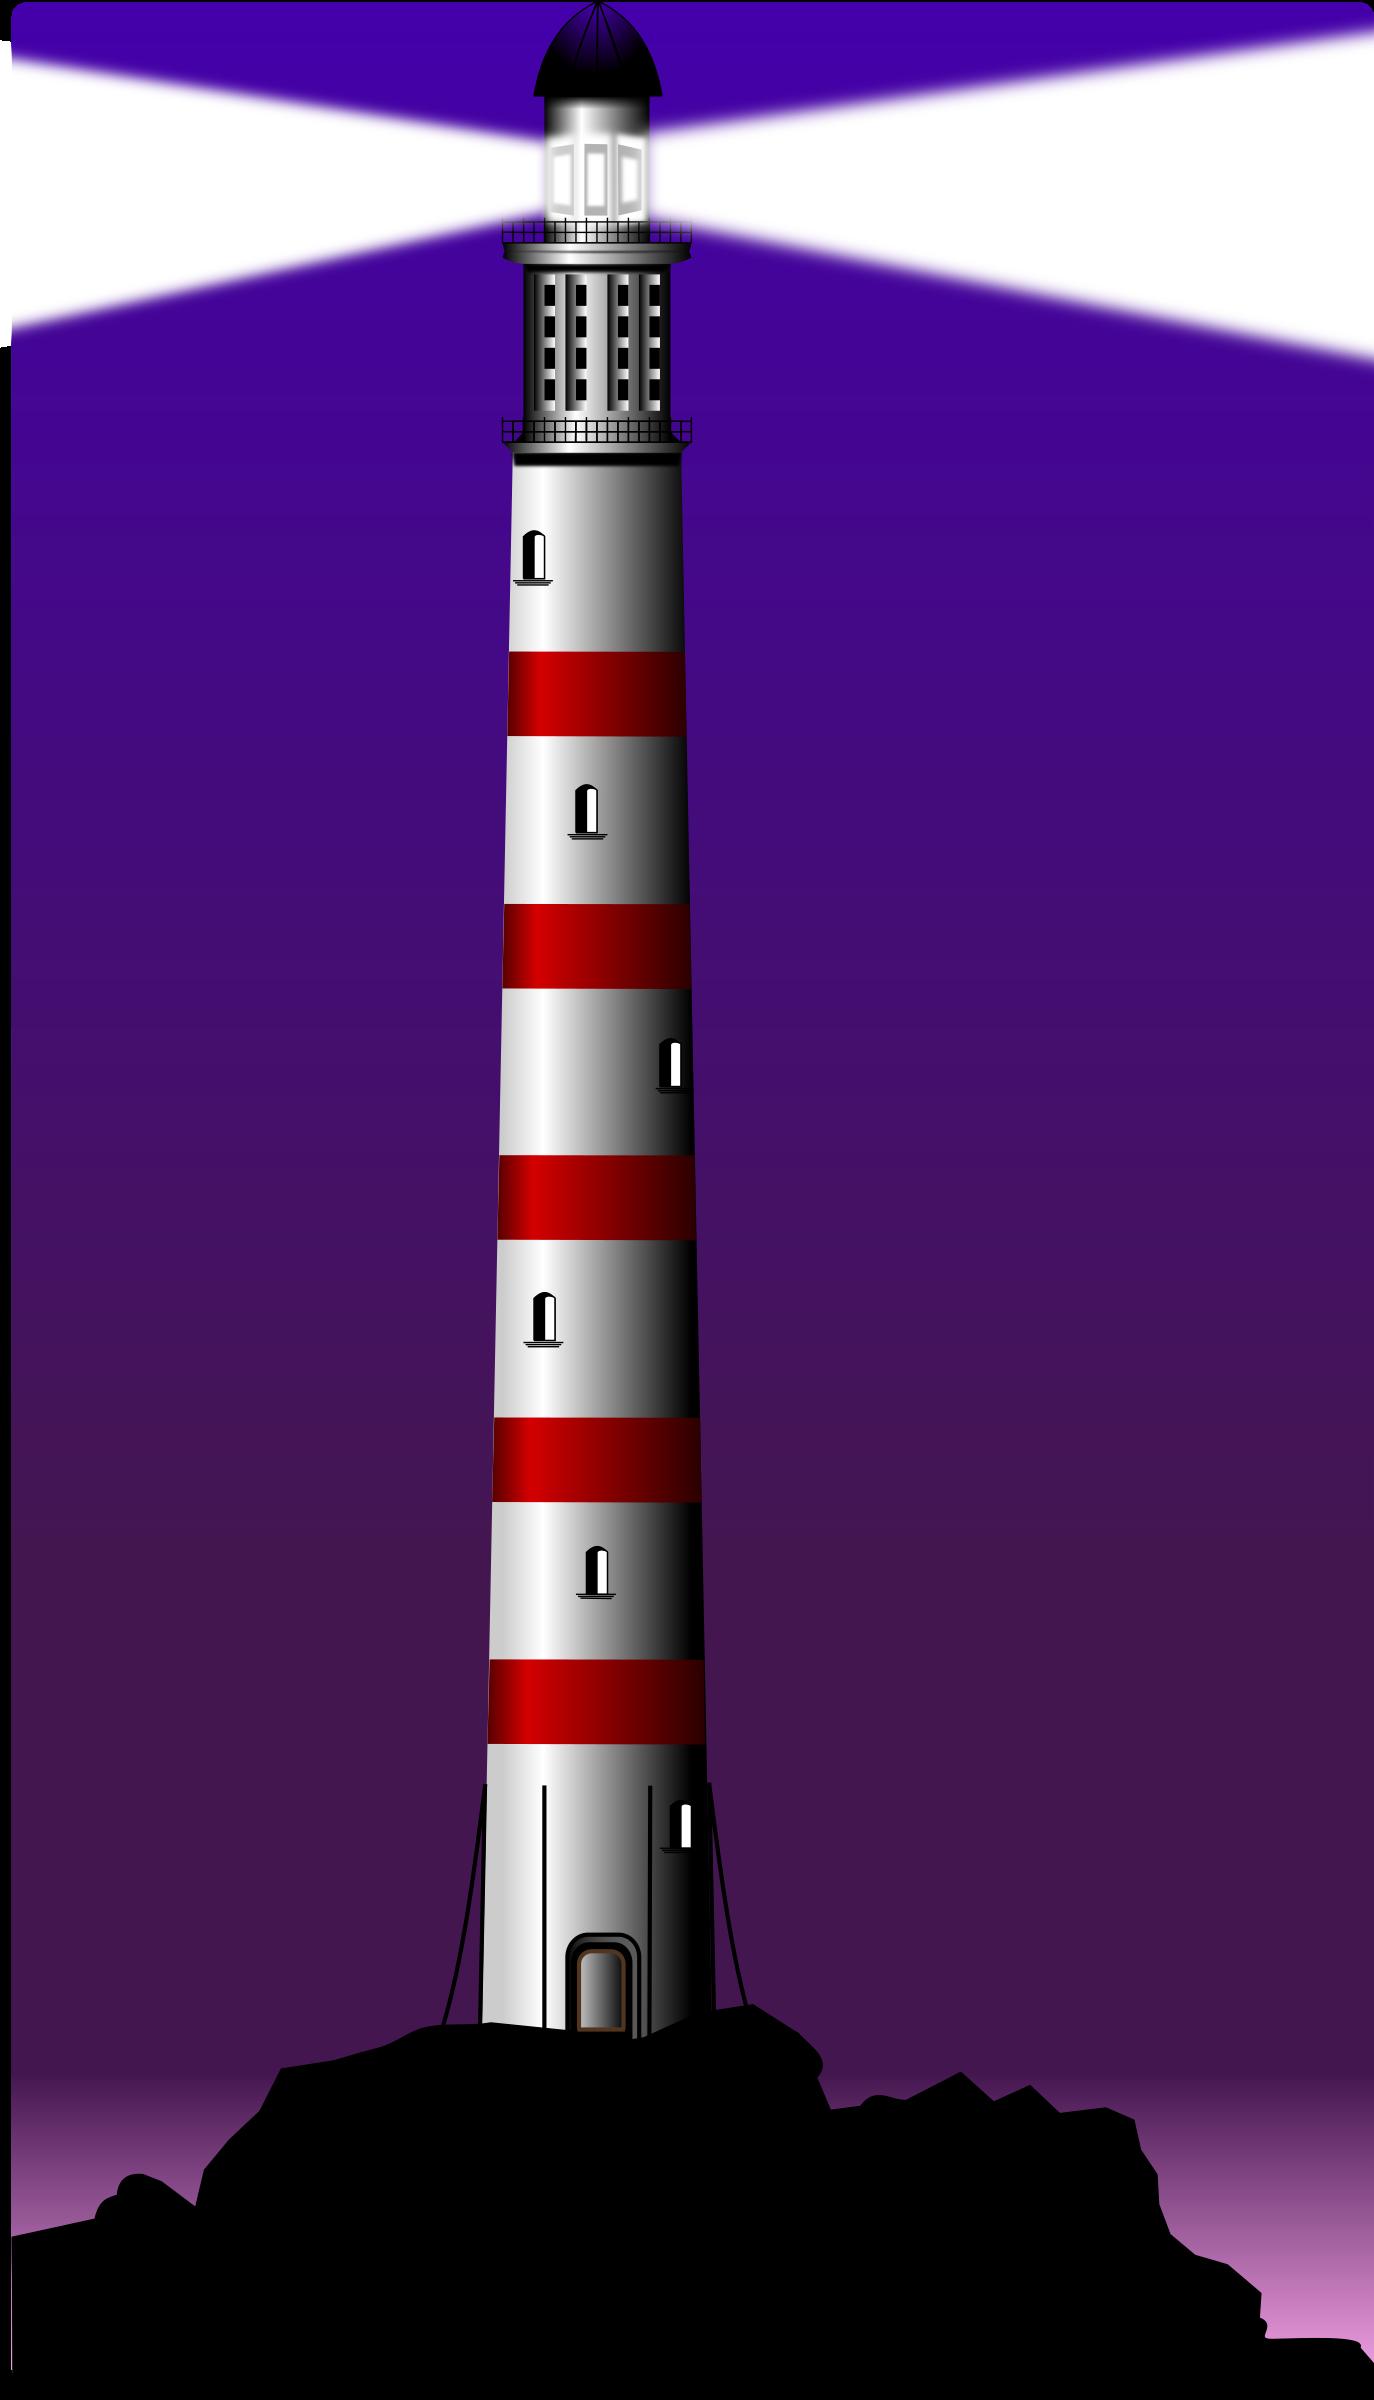 Lighhouse clipart purple Lighthouse Lighthouse Clipart